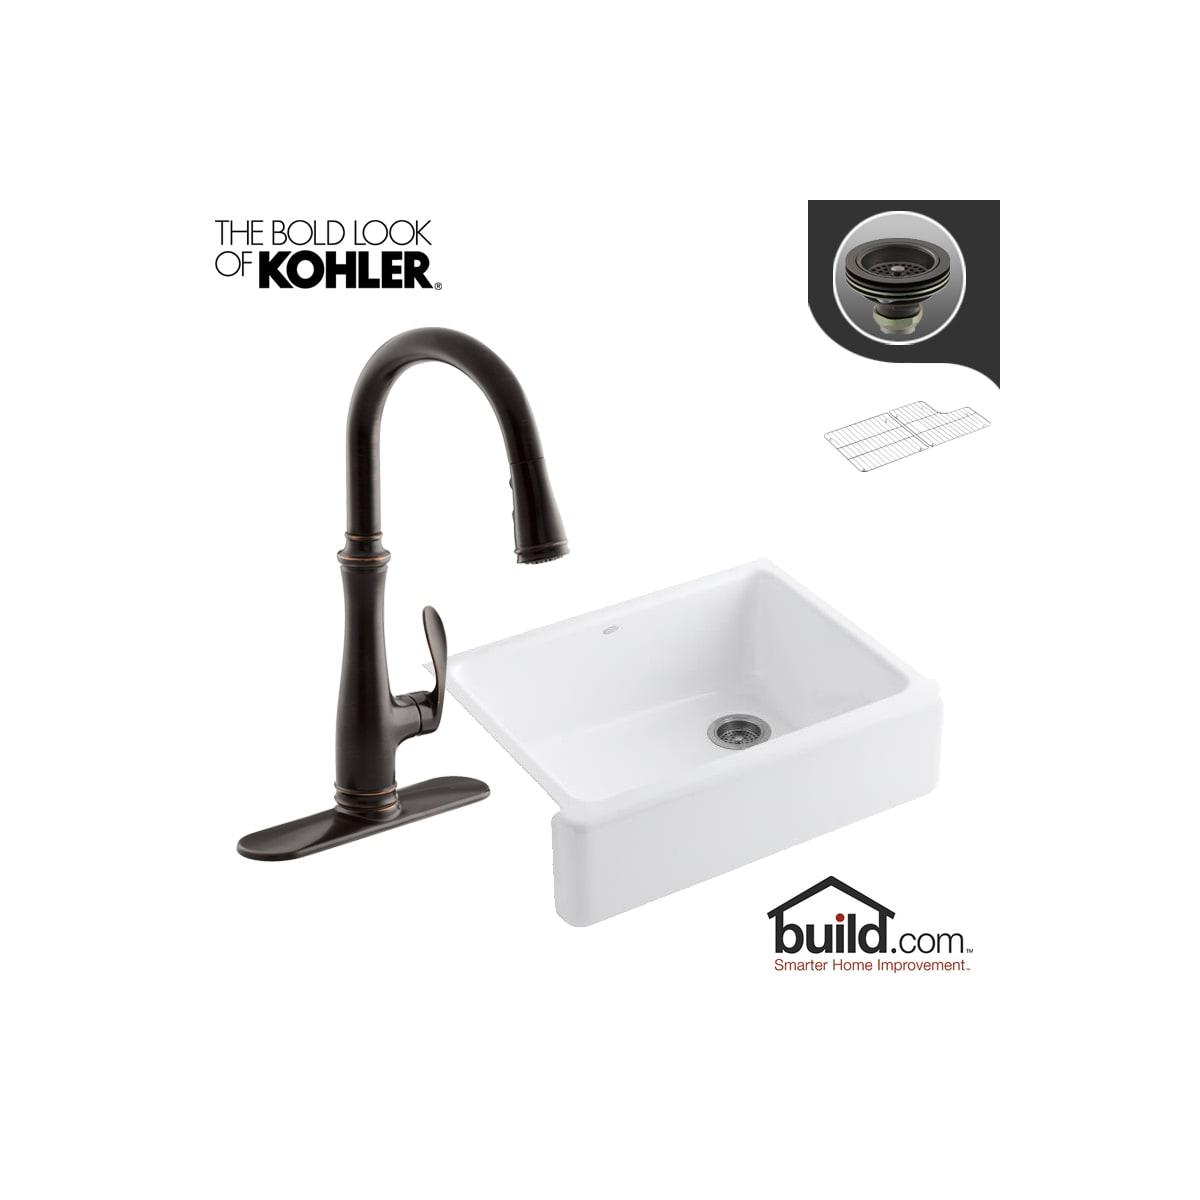 How To Tighten A Loose Kohler Kitchen Faucet Base ...